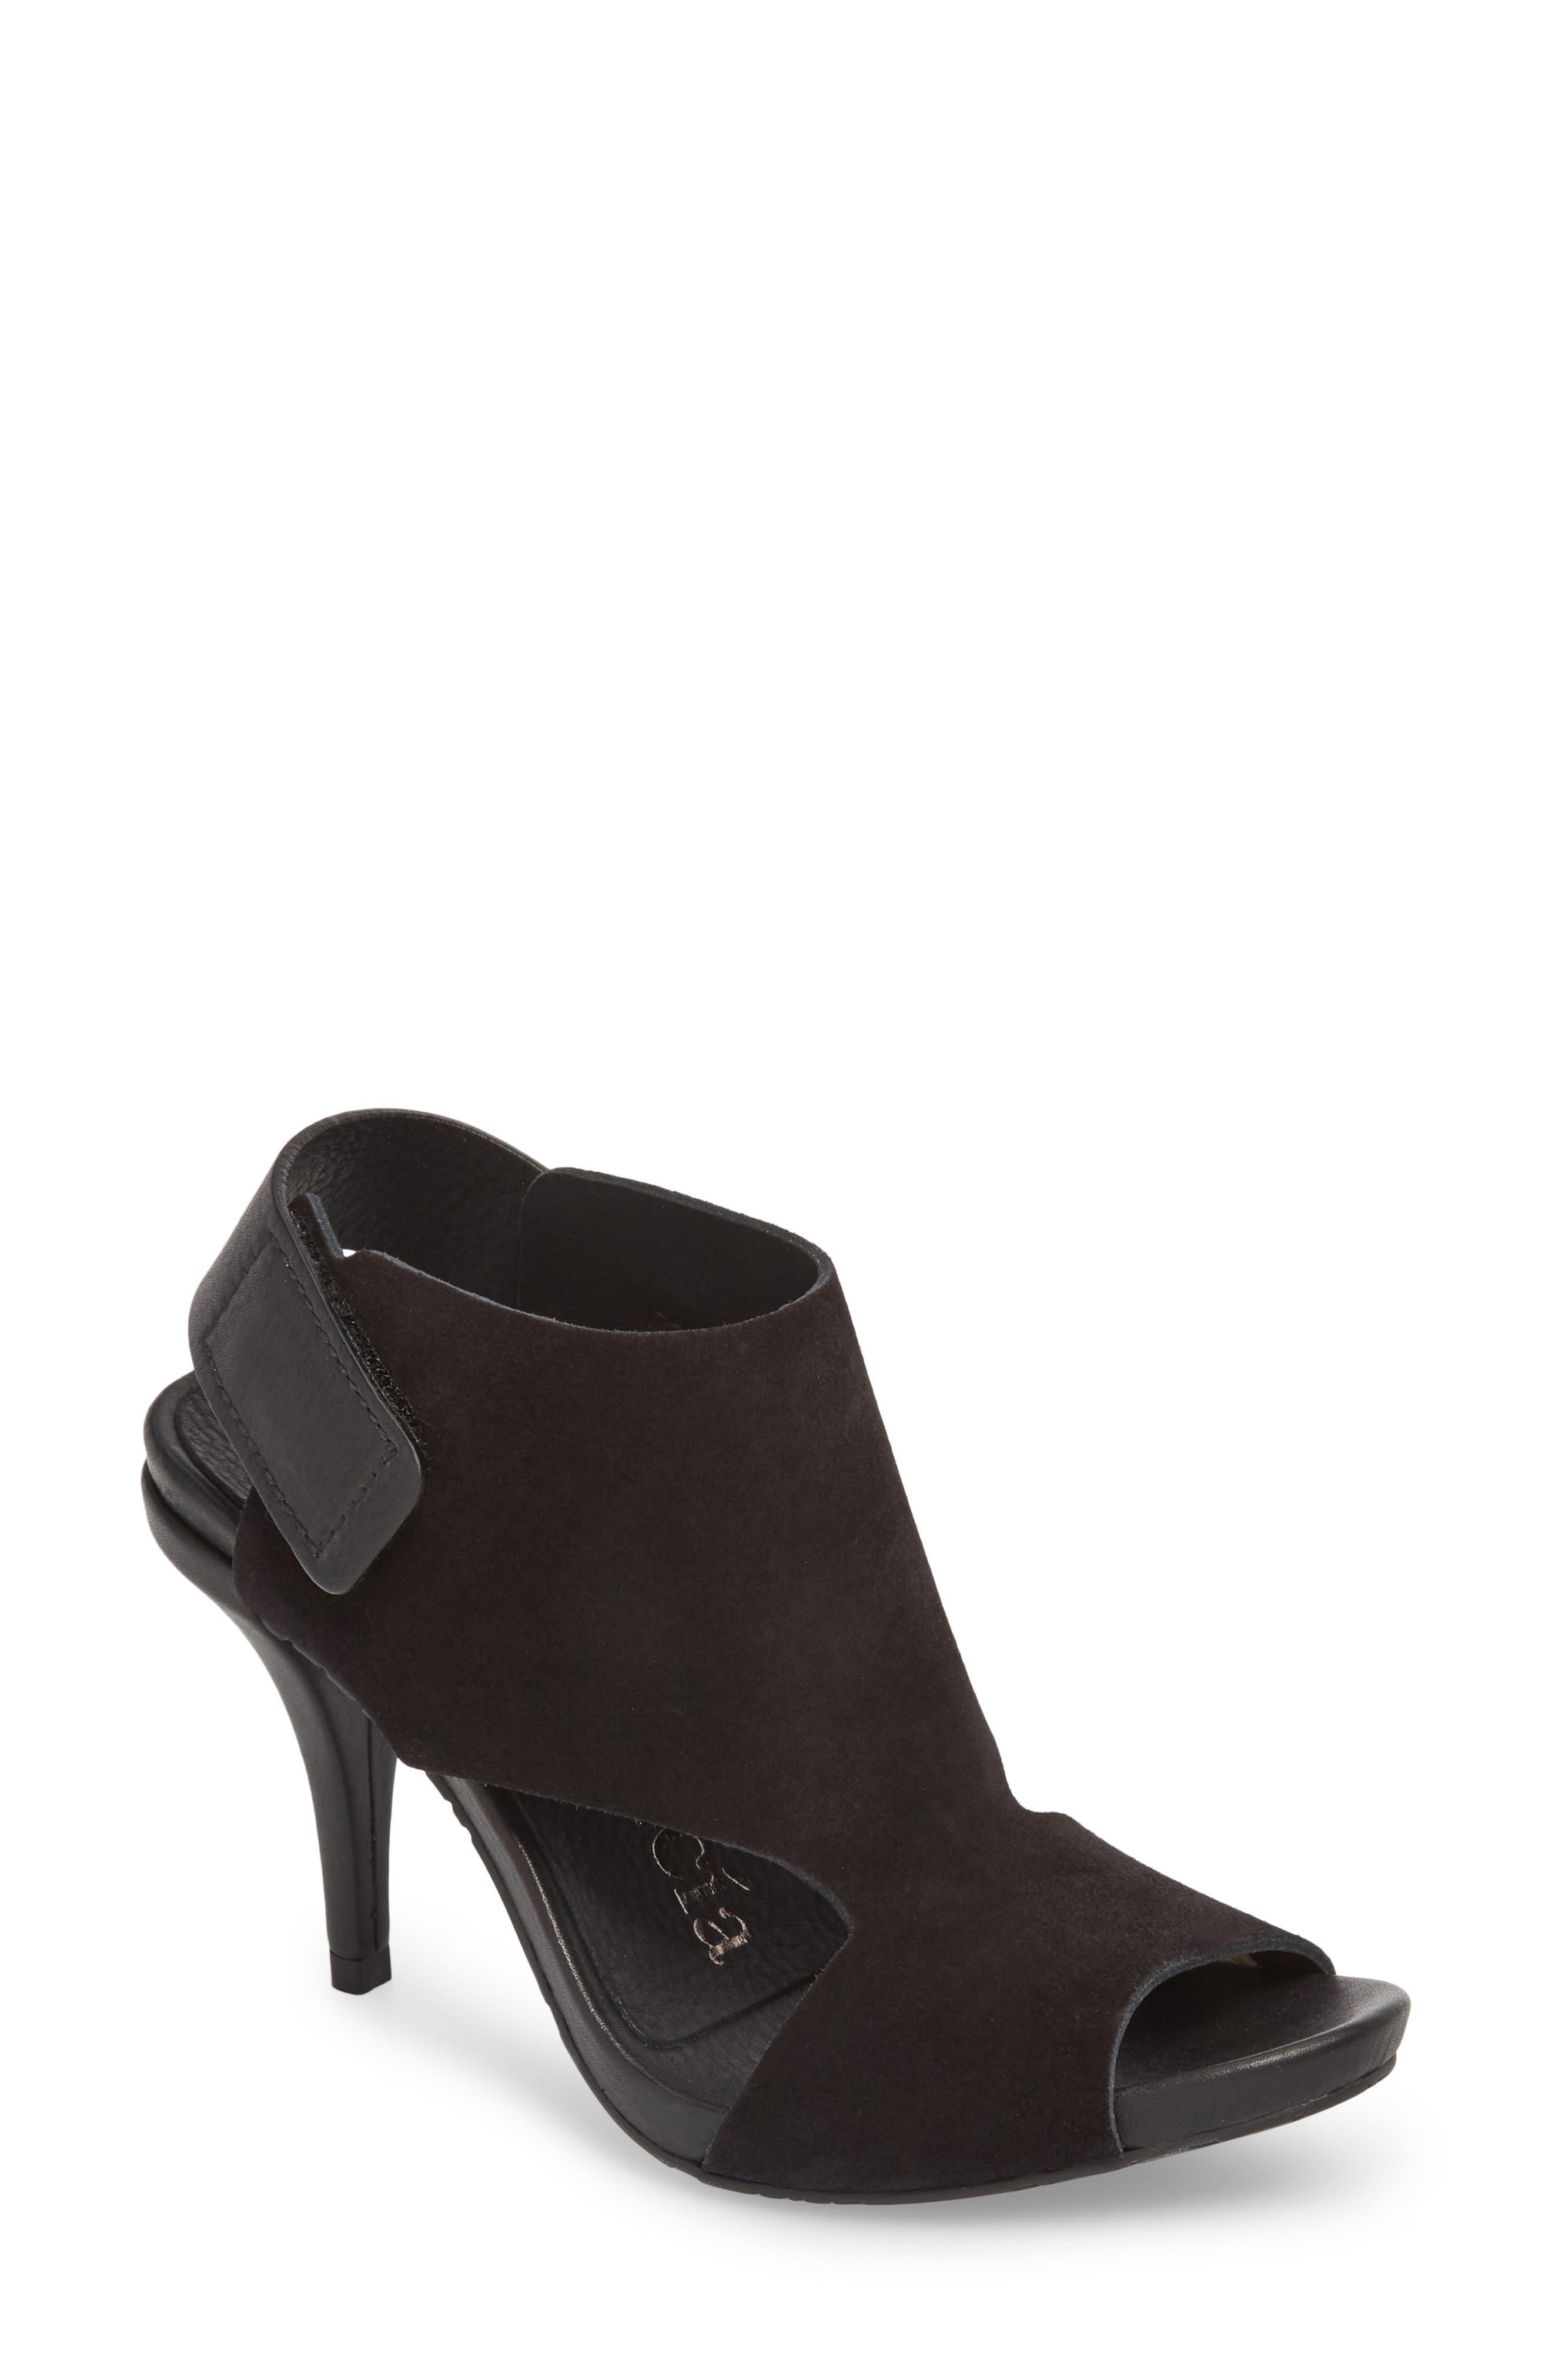 Yimina Cutout Sandal,                         Main,                         color, BLACK